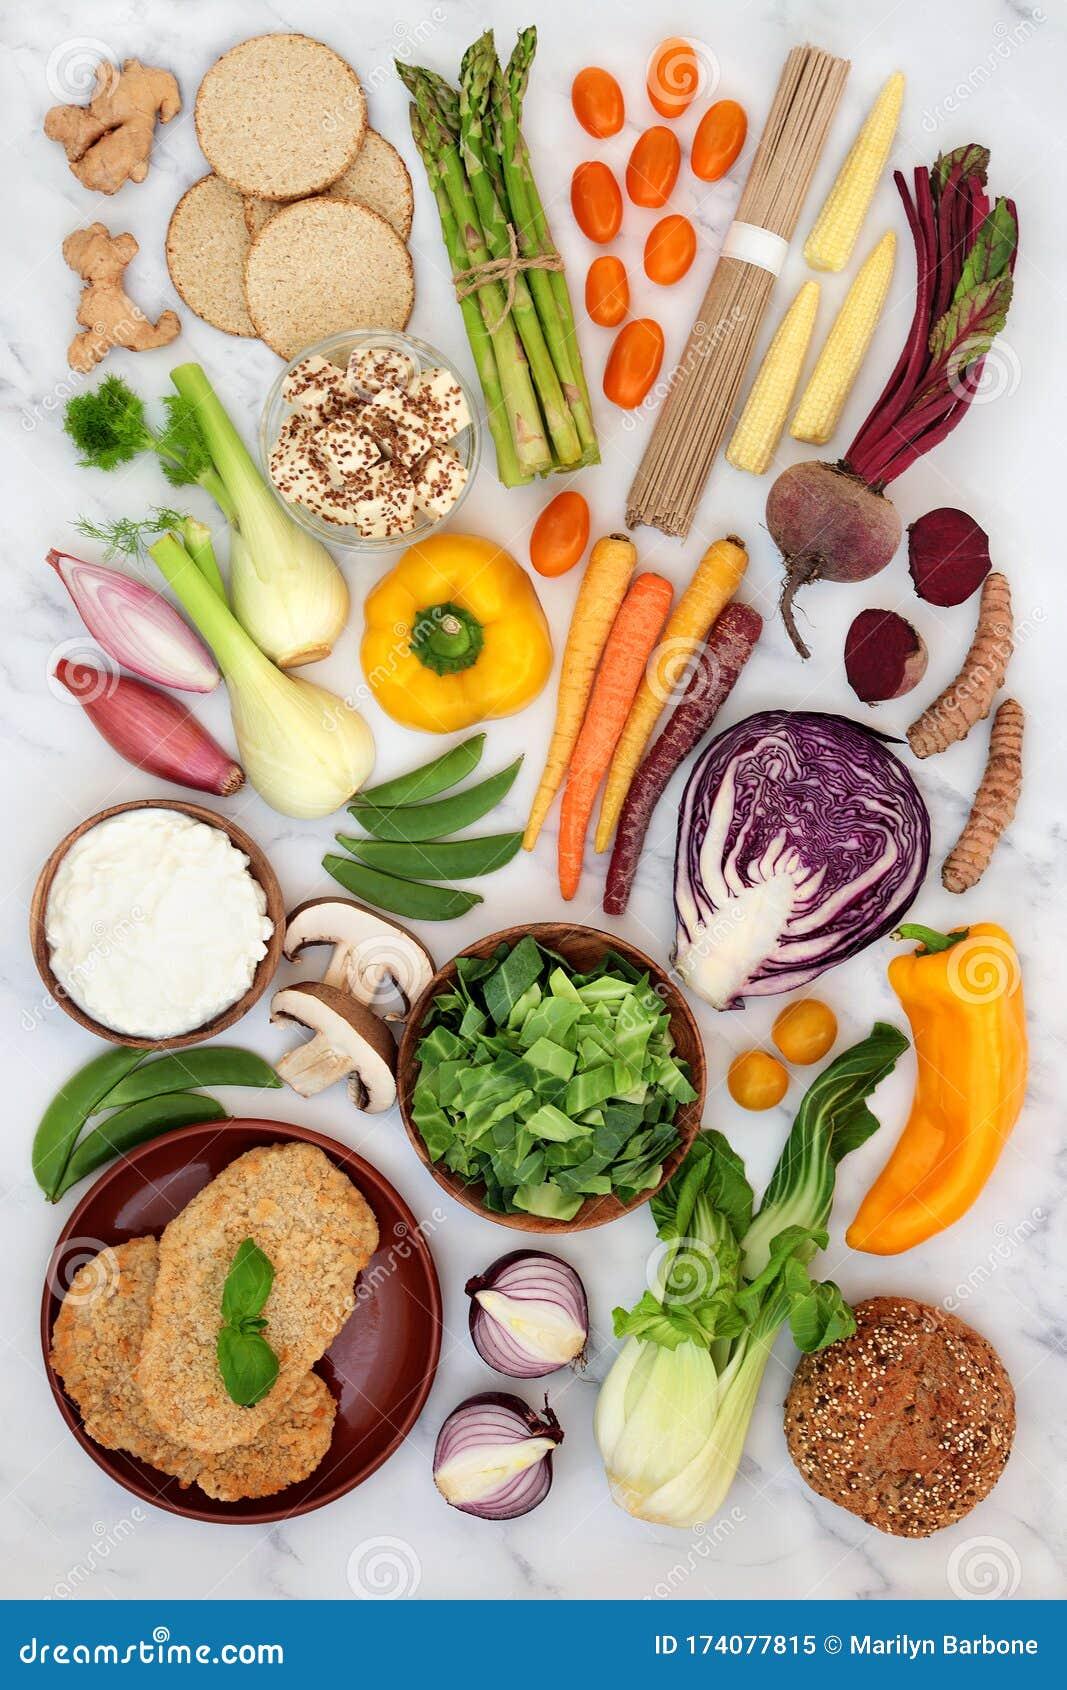 health   diet   fitness   vegan